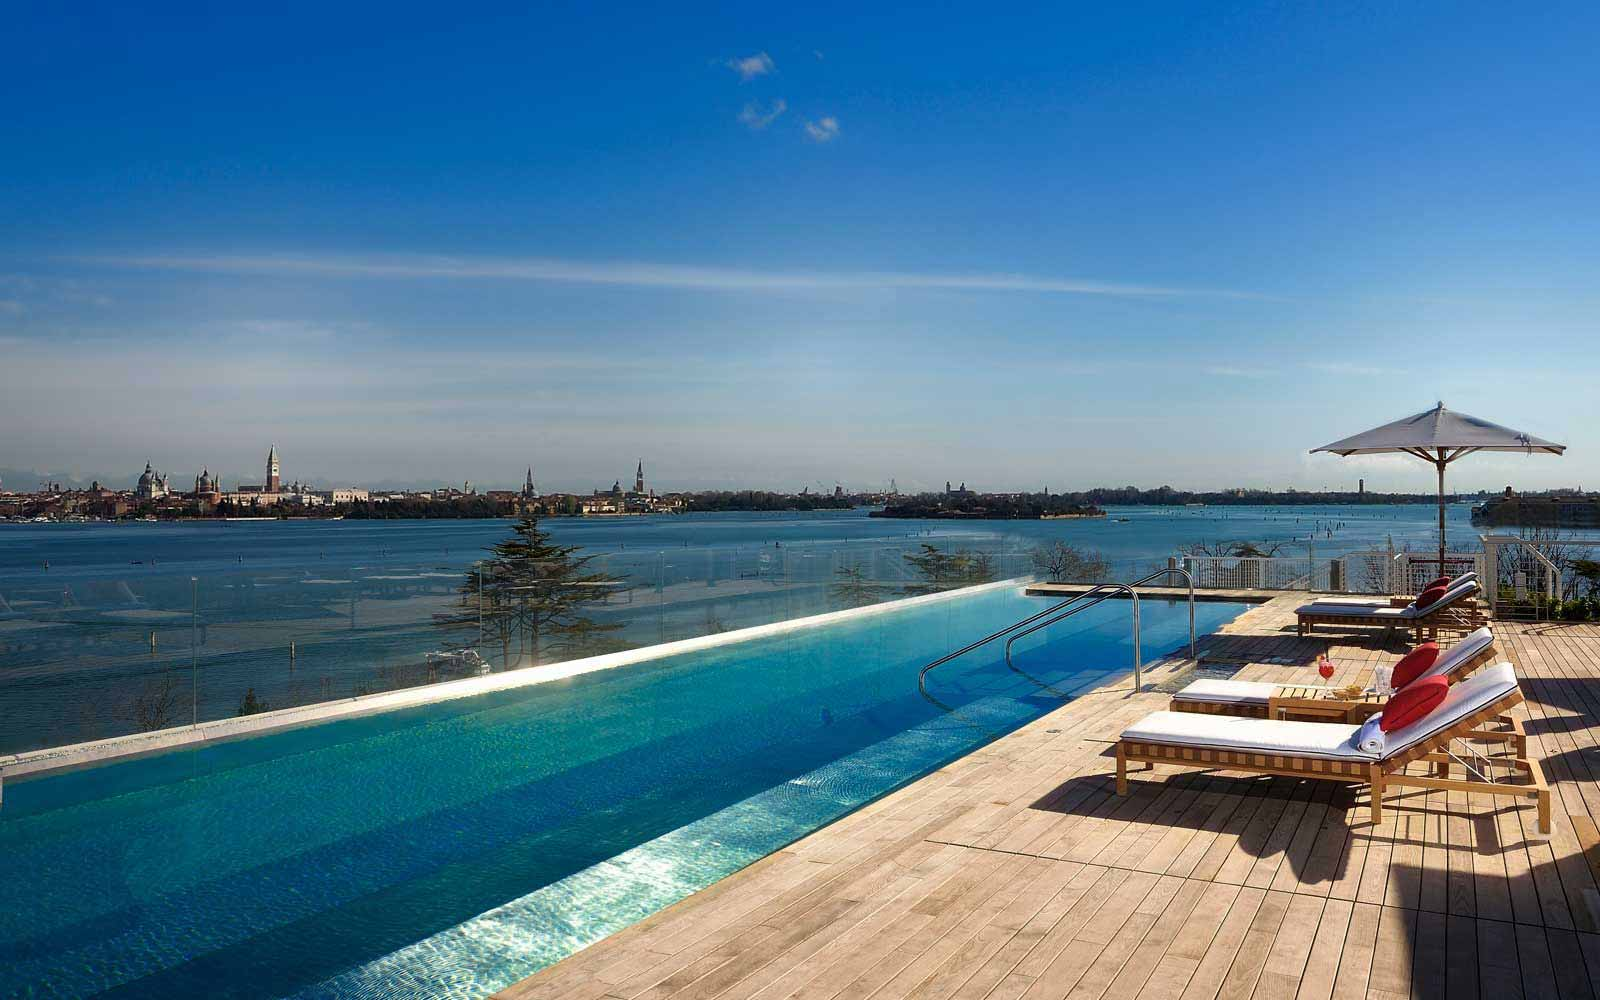 Rooftop pool at JW Marriott Venice Resort & Spa